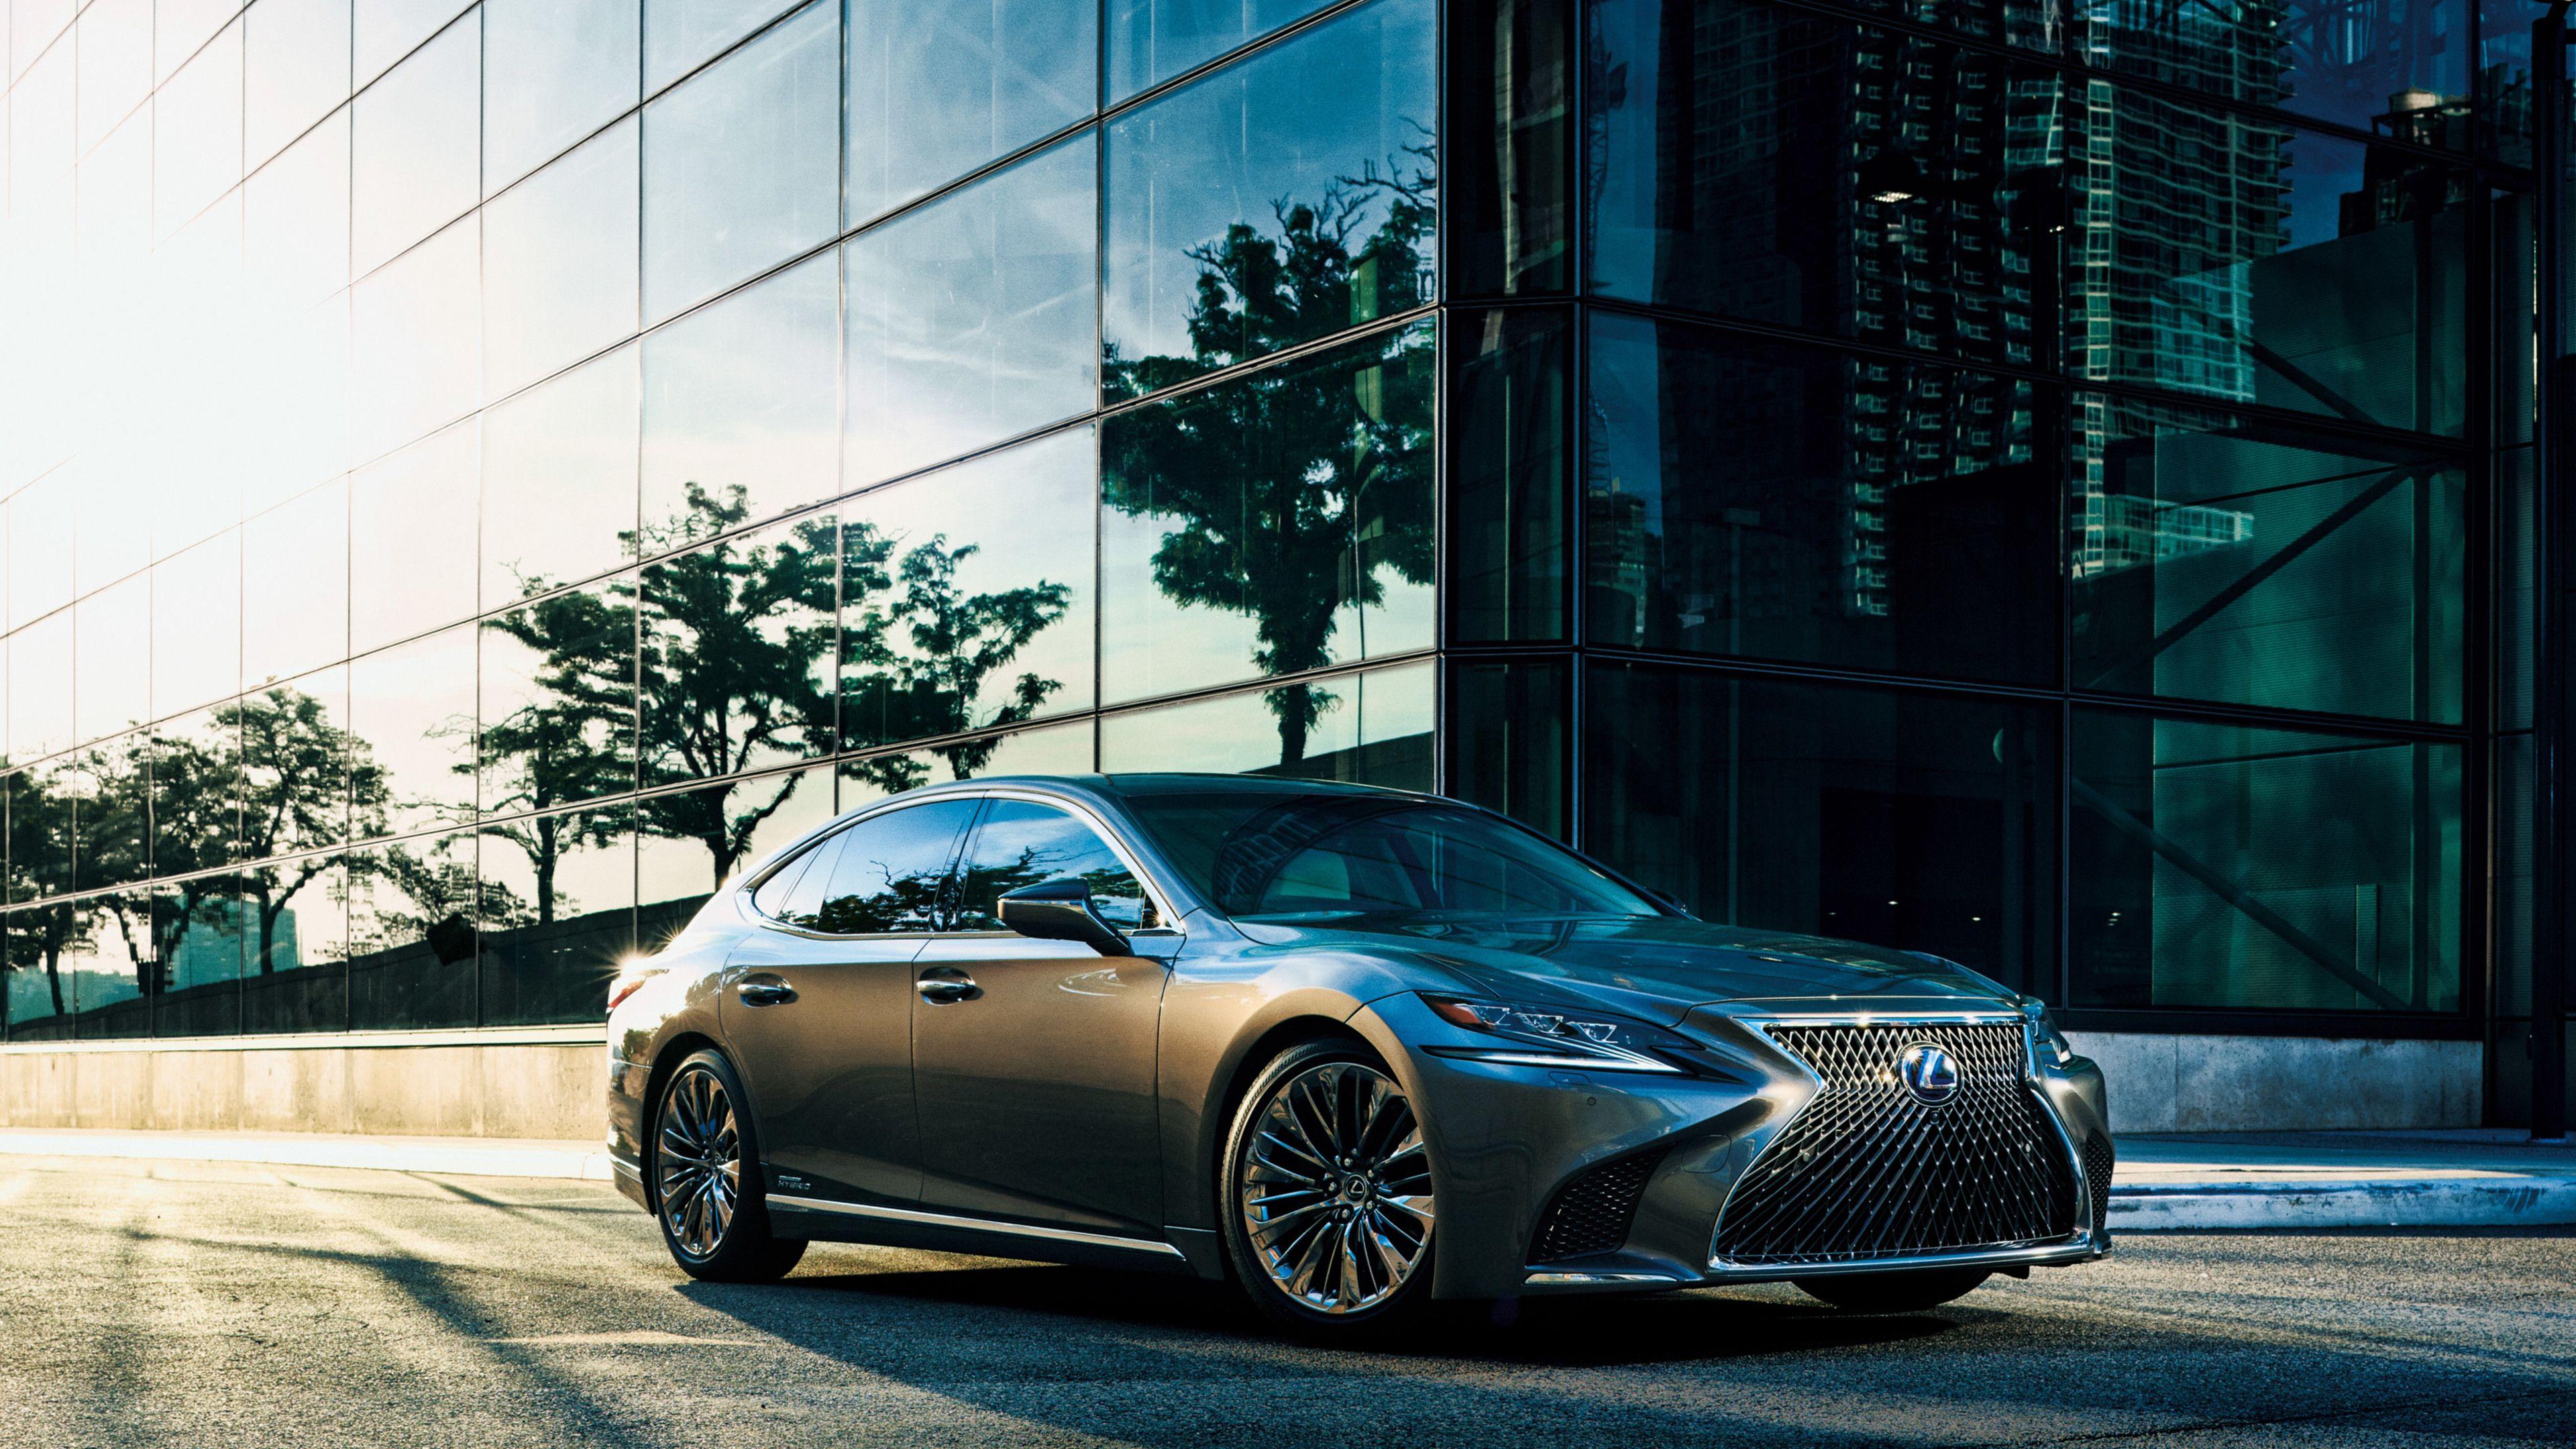 Lexus Ls 500h 2017 Lexus Wallpapers Hd Wallpapers Cars Wallpapers 4k Wallpapers 2017 Cars Wallpapers Lexus Ls Car Wallpapers Lexus